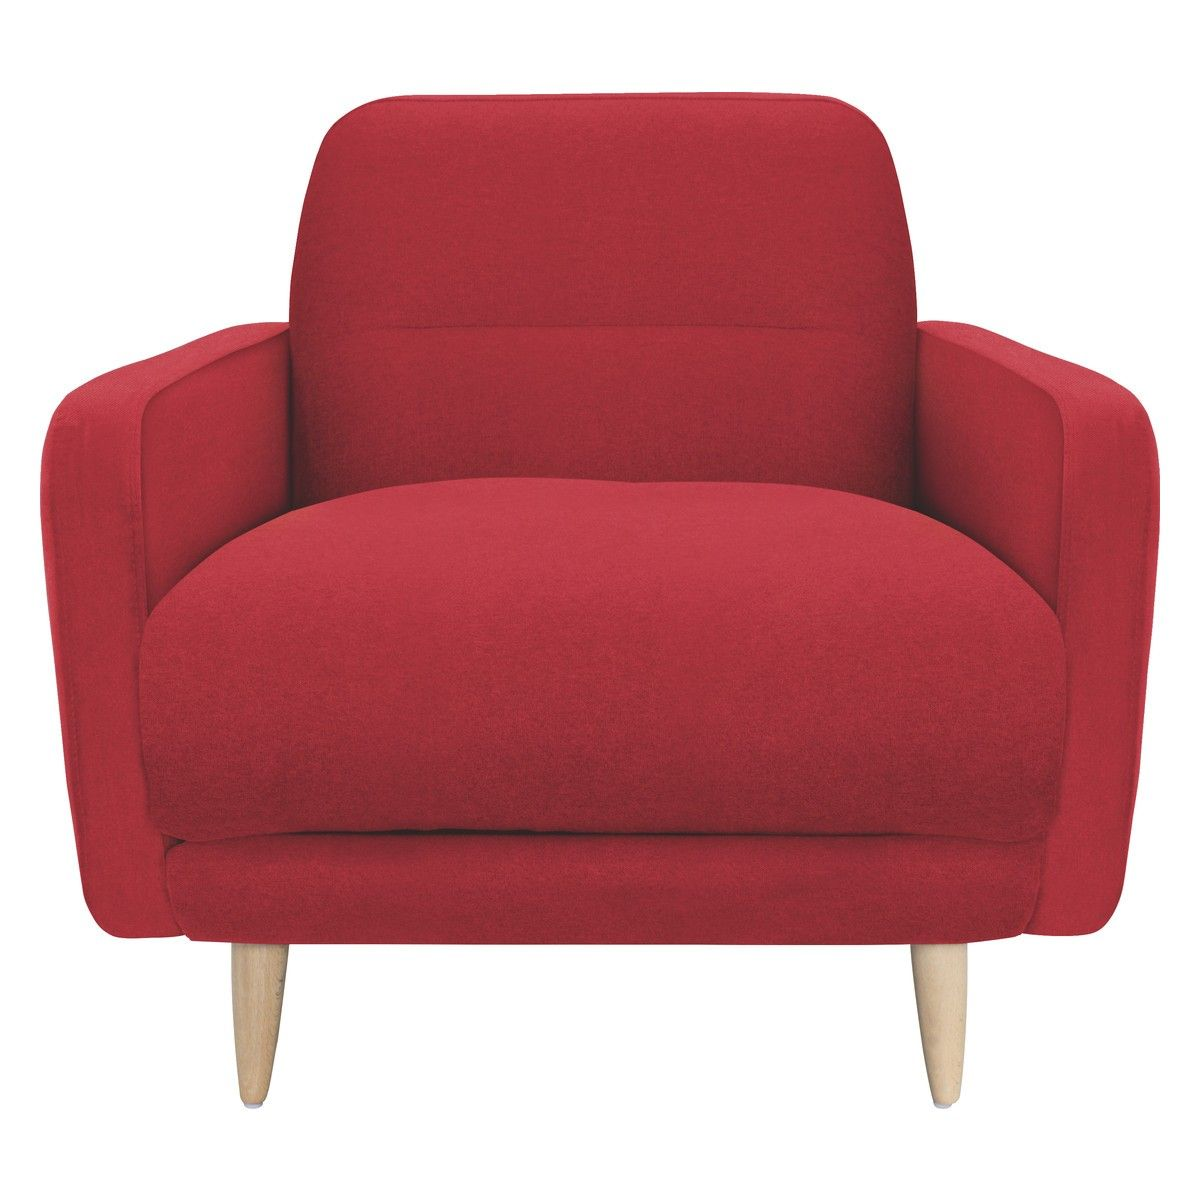 Abel Red Fabric Armchair Buy Now At Habitat Uk Playroom Revamp